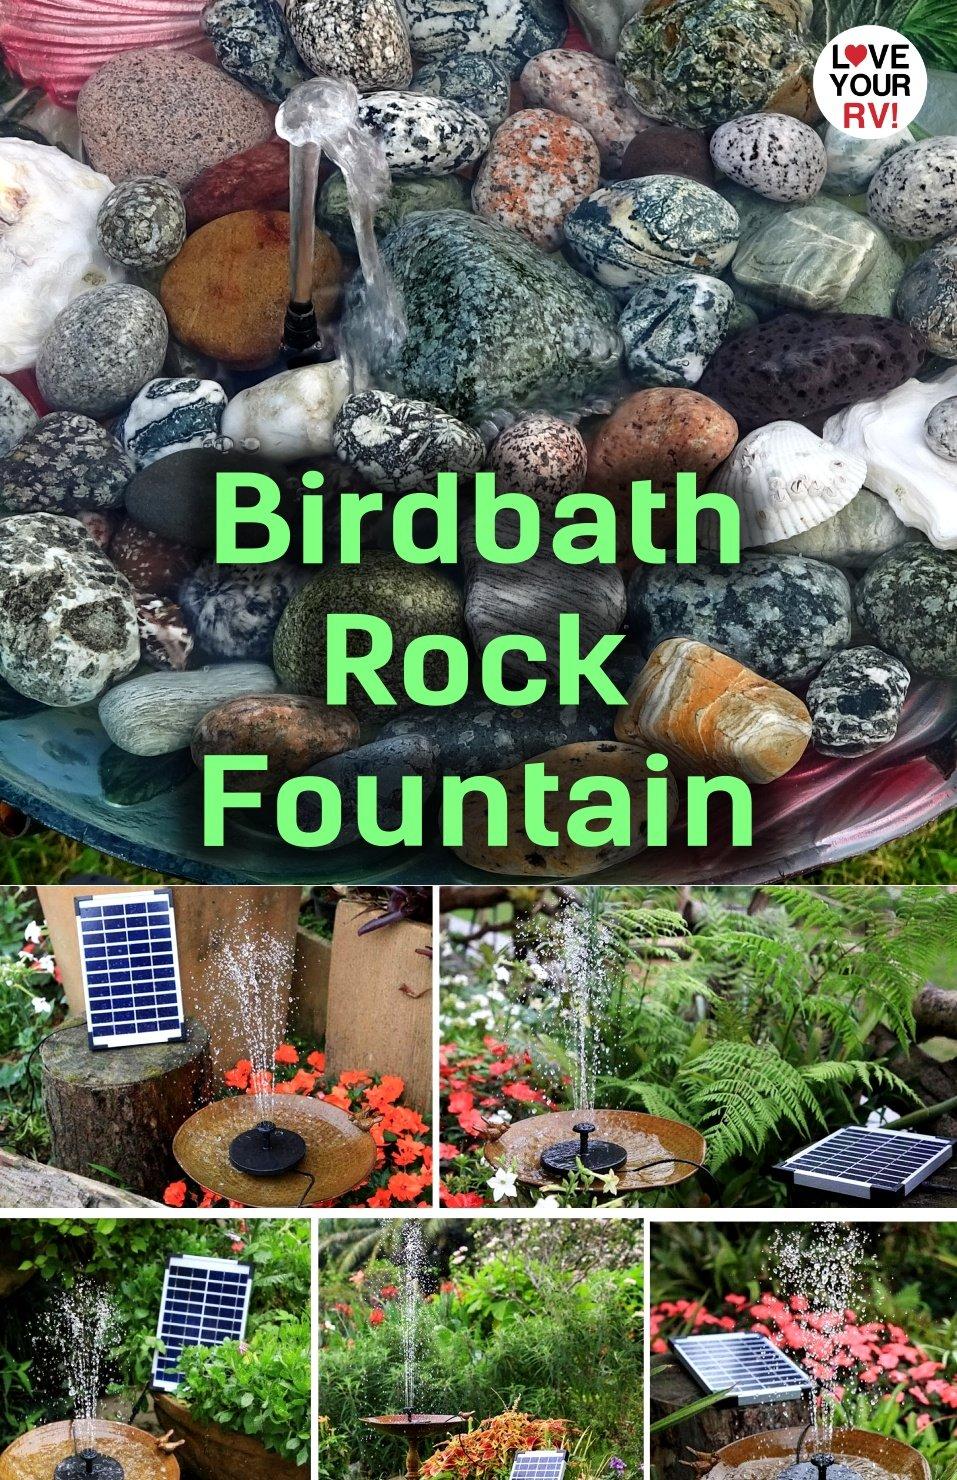 Campsite Decoration Idea - Solar Bird Bath Fountain with Cool Beach Rock Collection